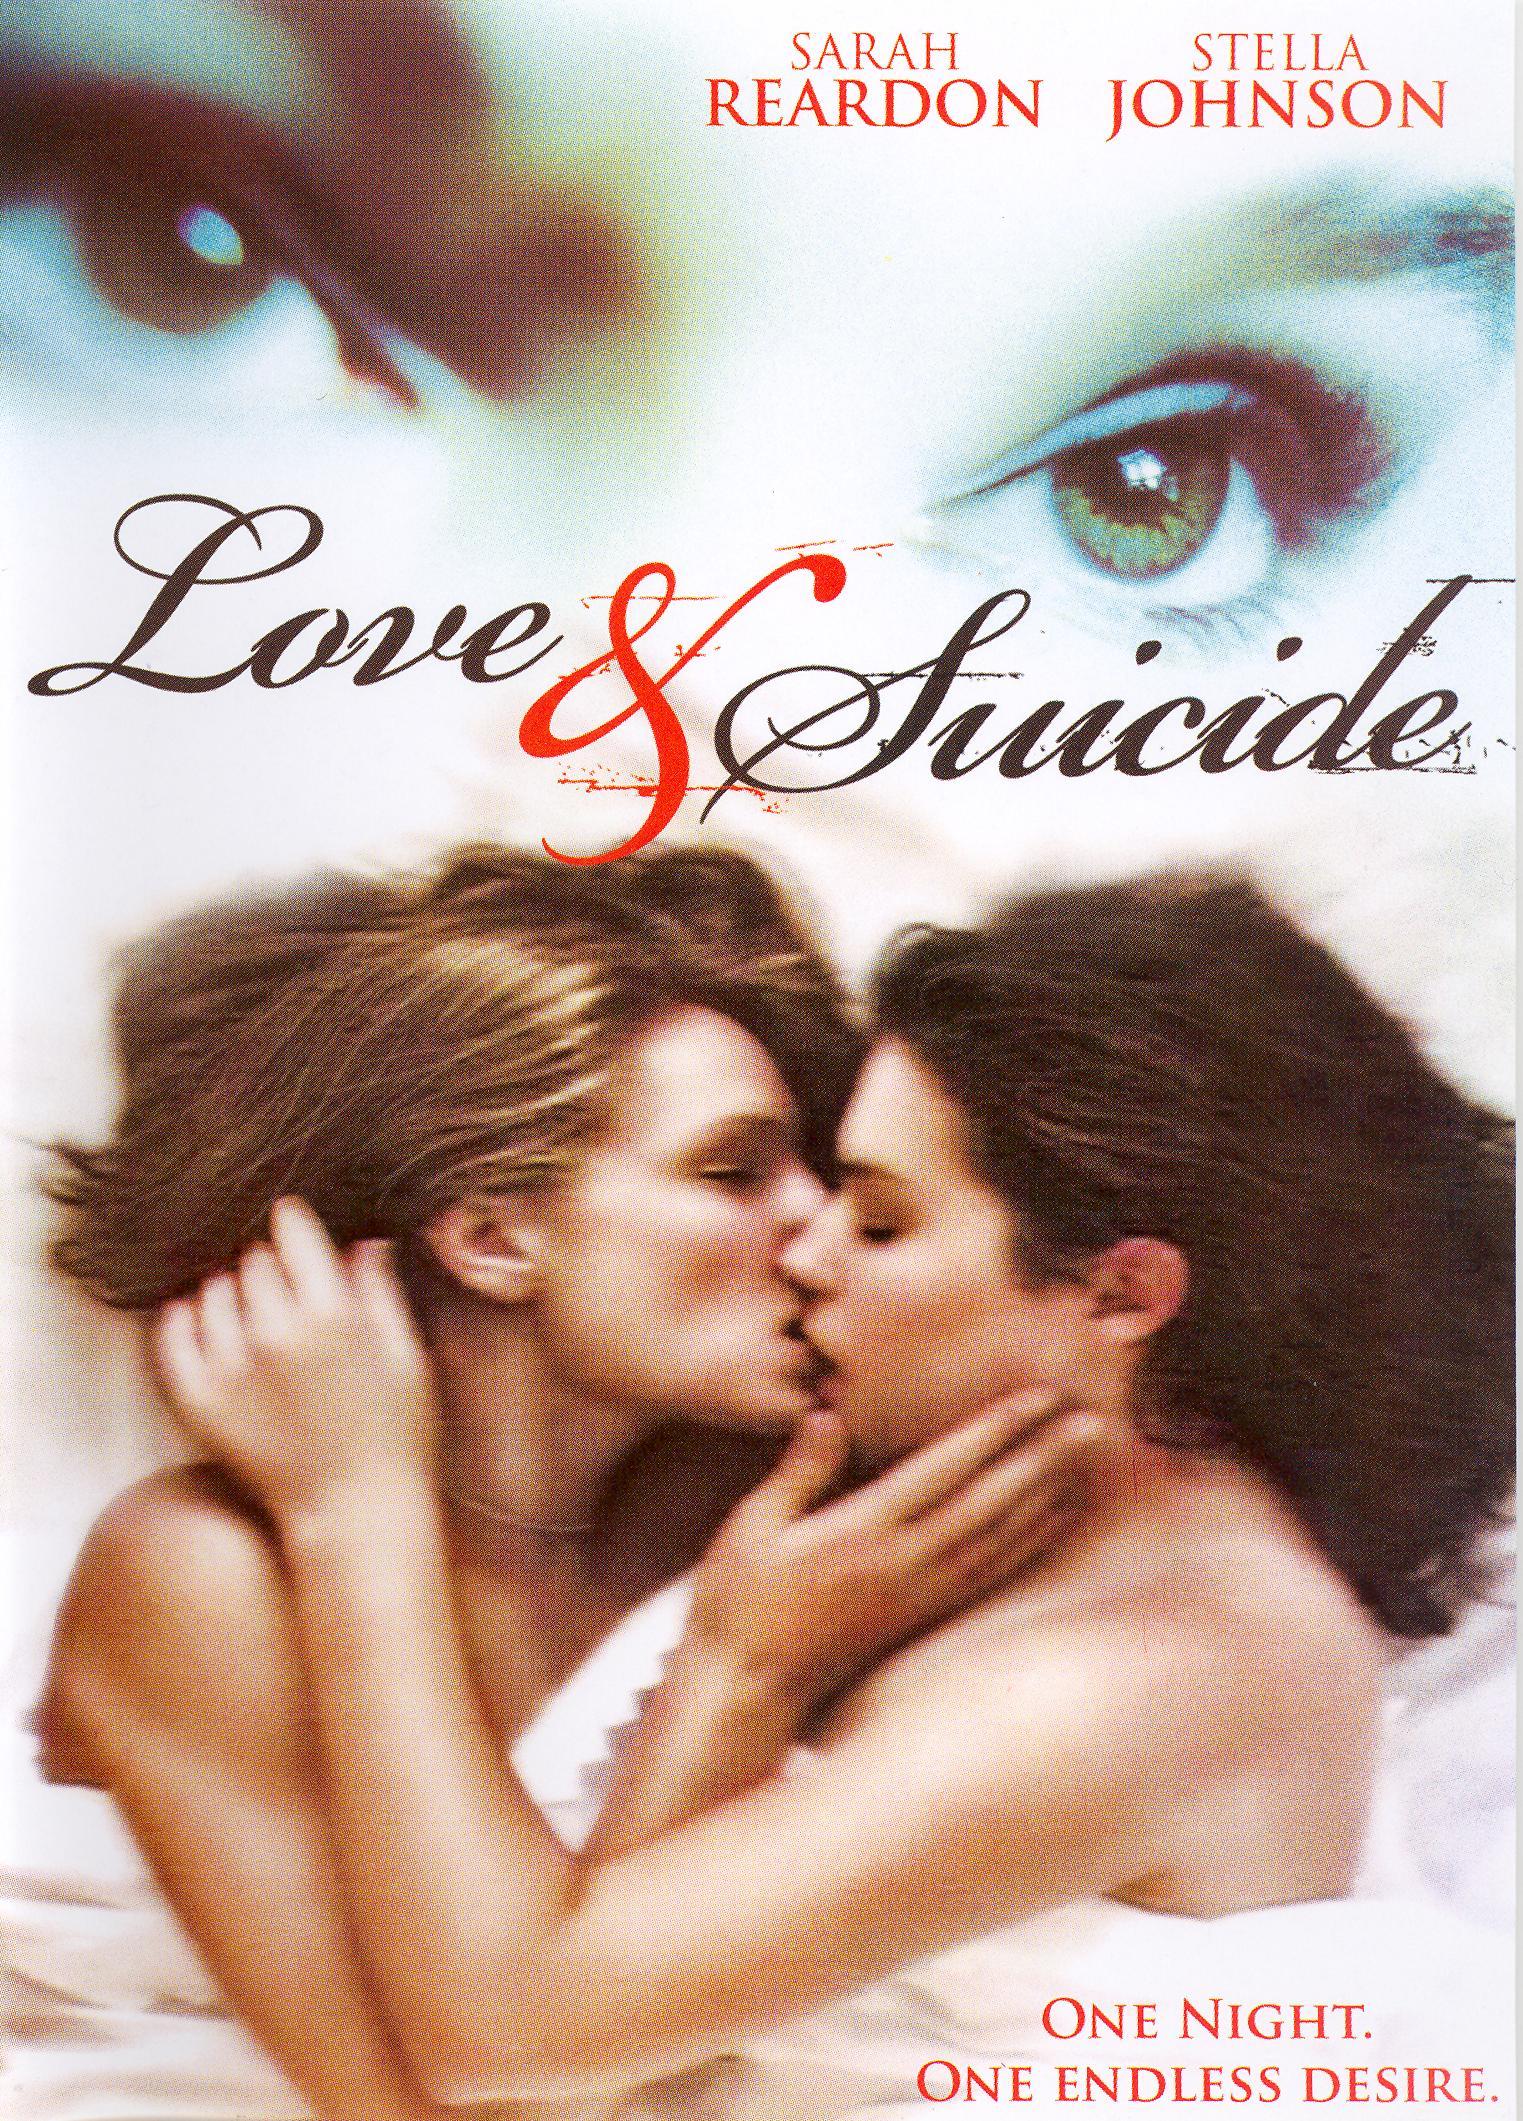 Смотреть онлайн lesbian love stories 9 фотография